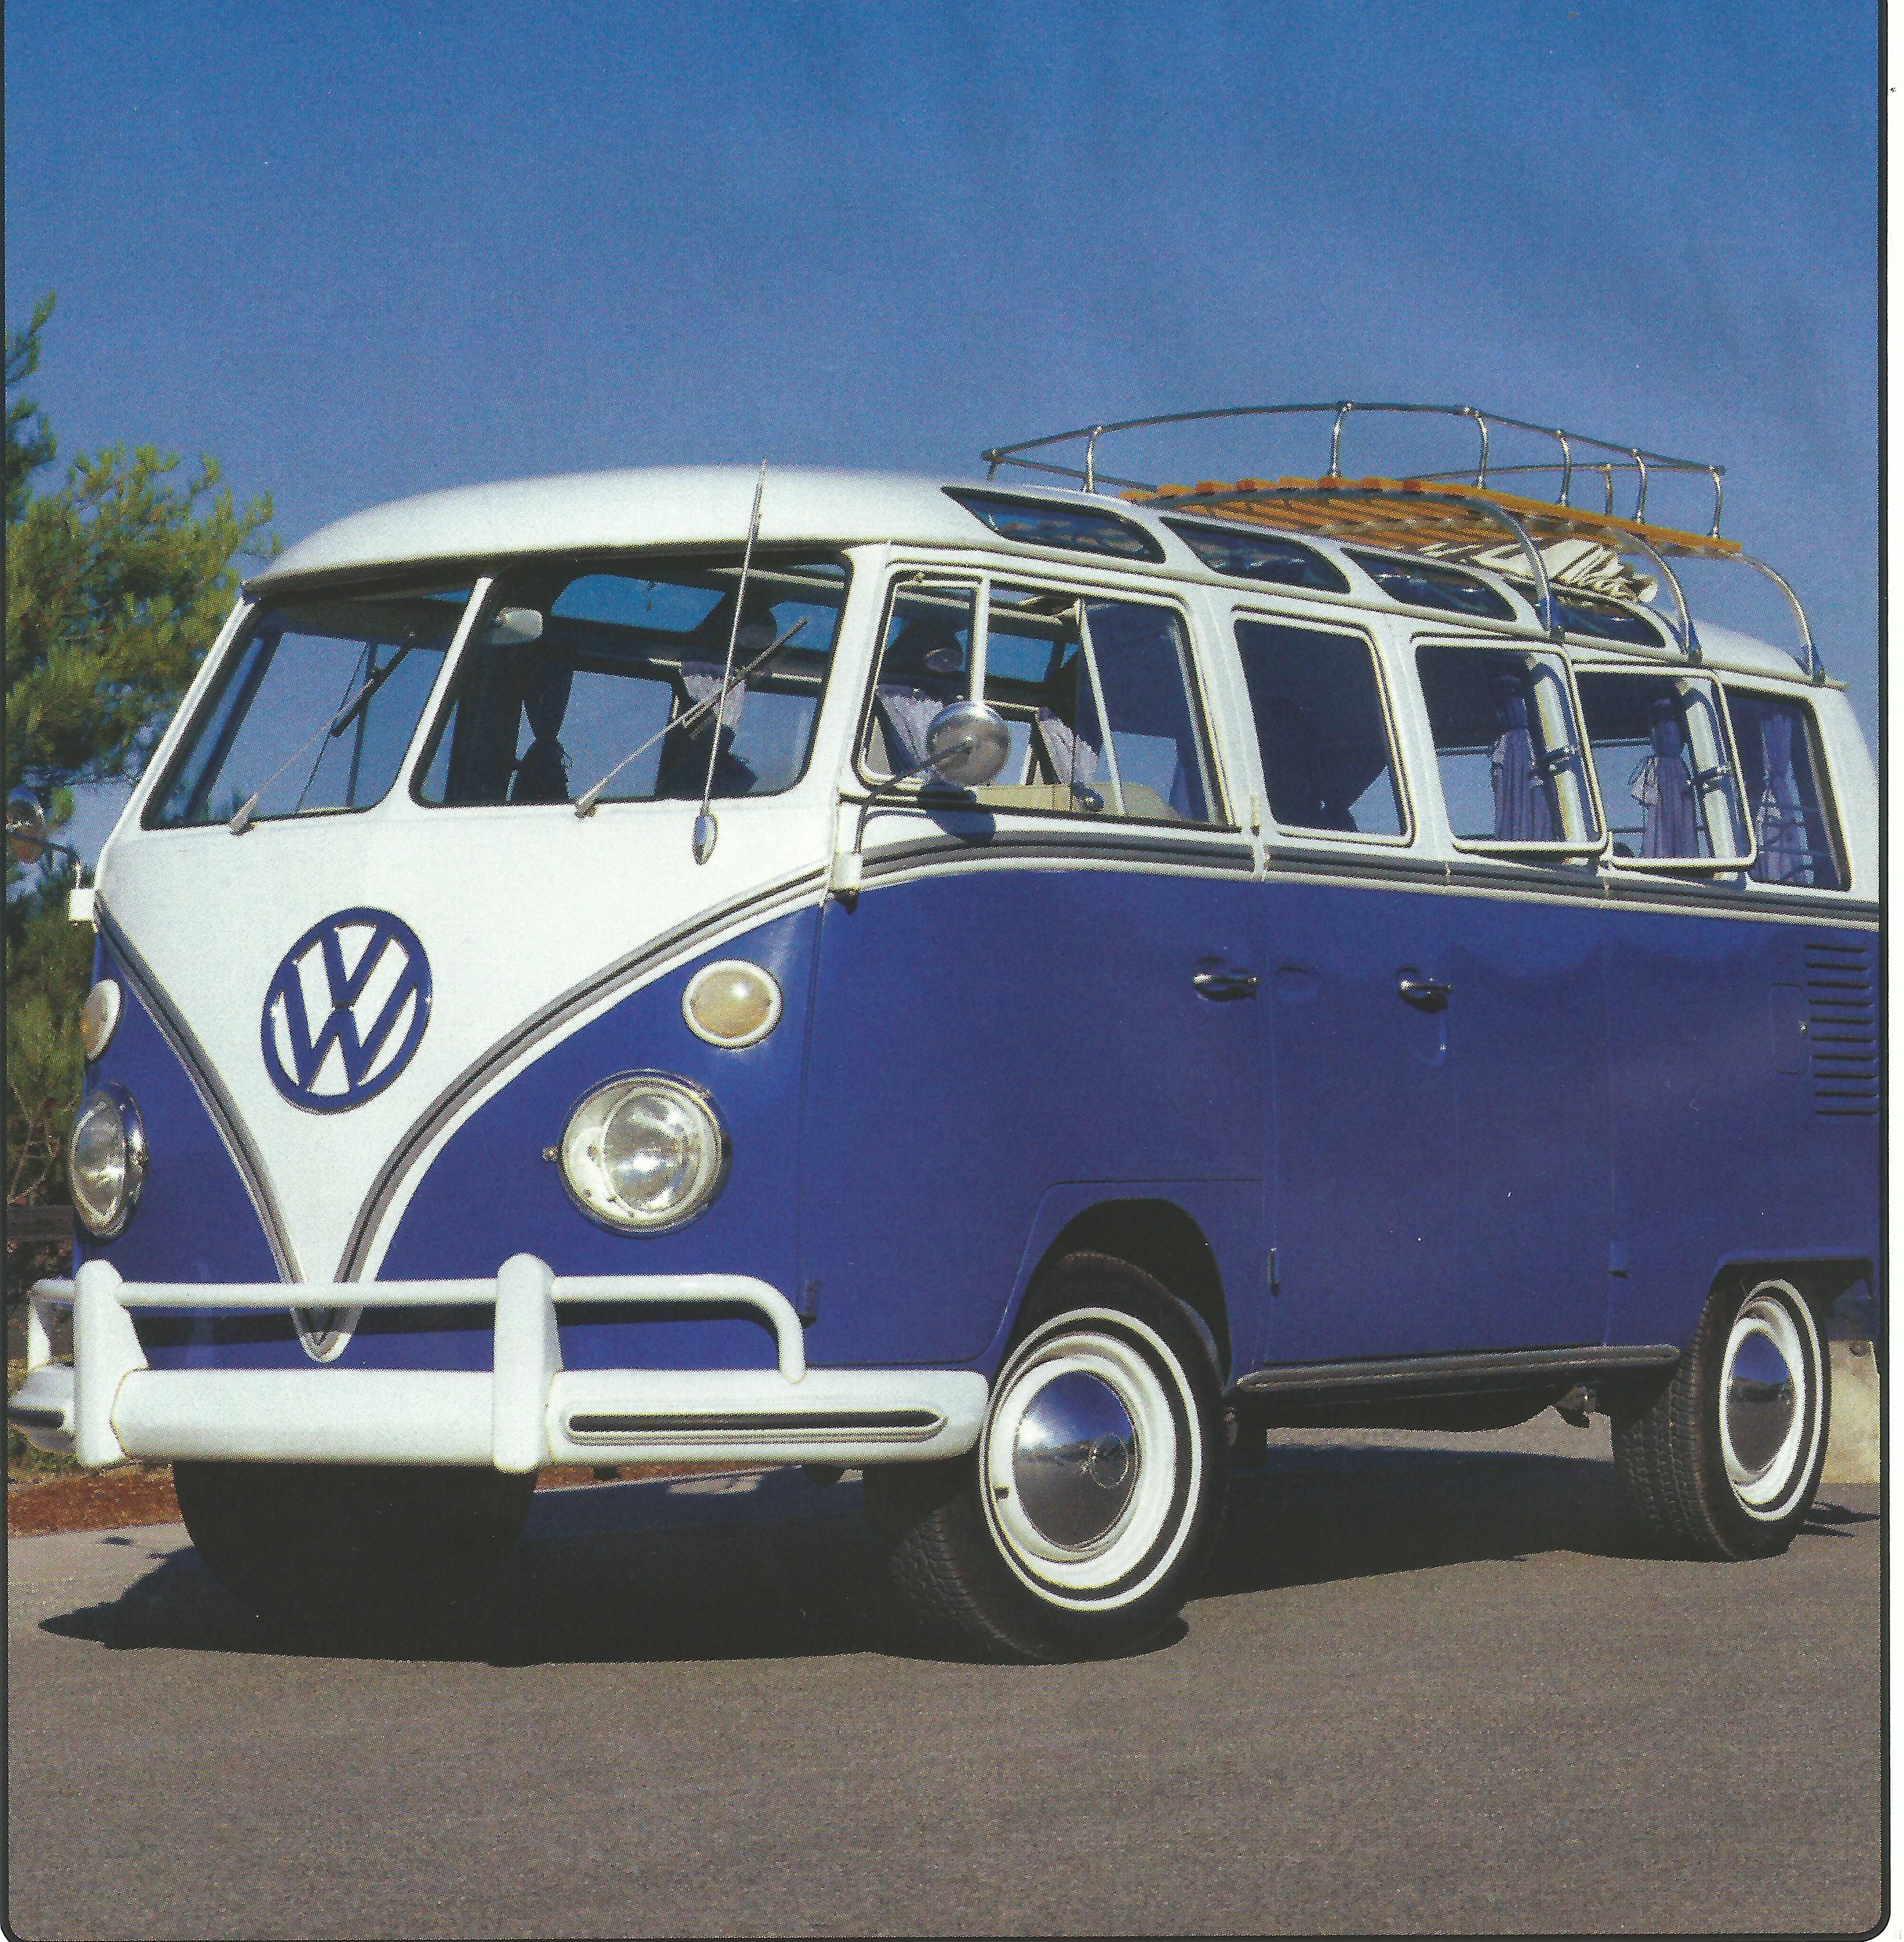 1965 vw deluxe microbus 21 windows vw microbus pinterest for 1965 vw 21 window bus